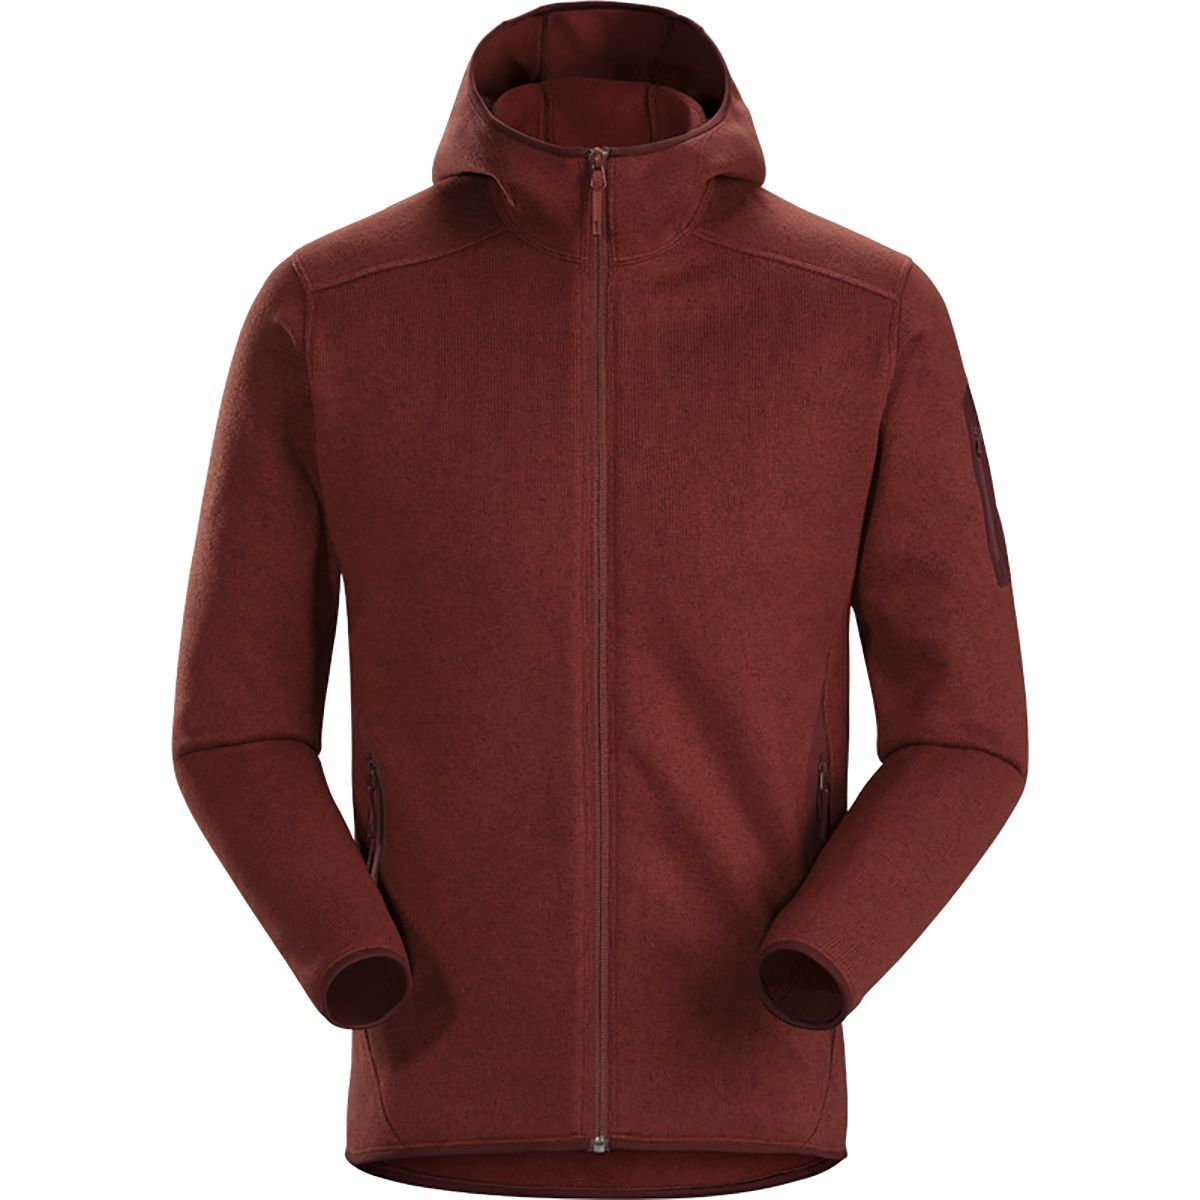 Photo of Arc'teryx Covert Fleece Hooded Jacket – Men's